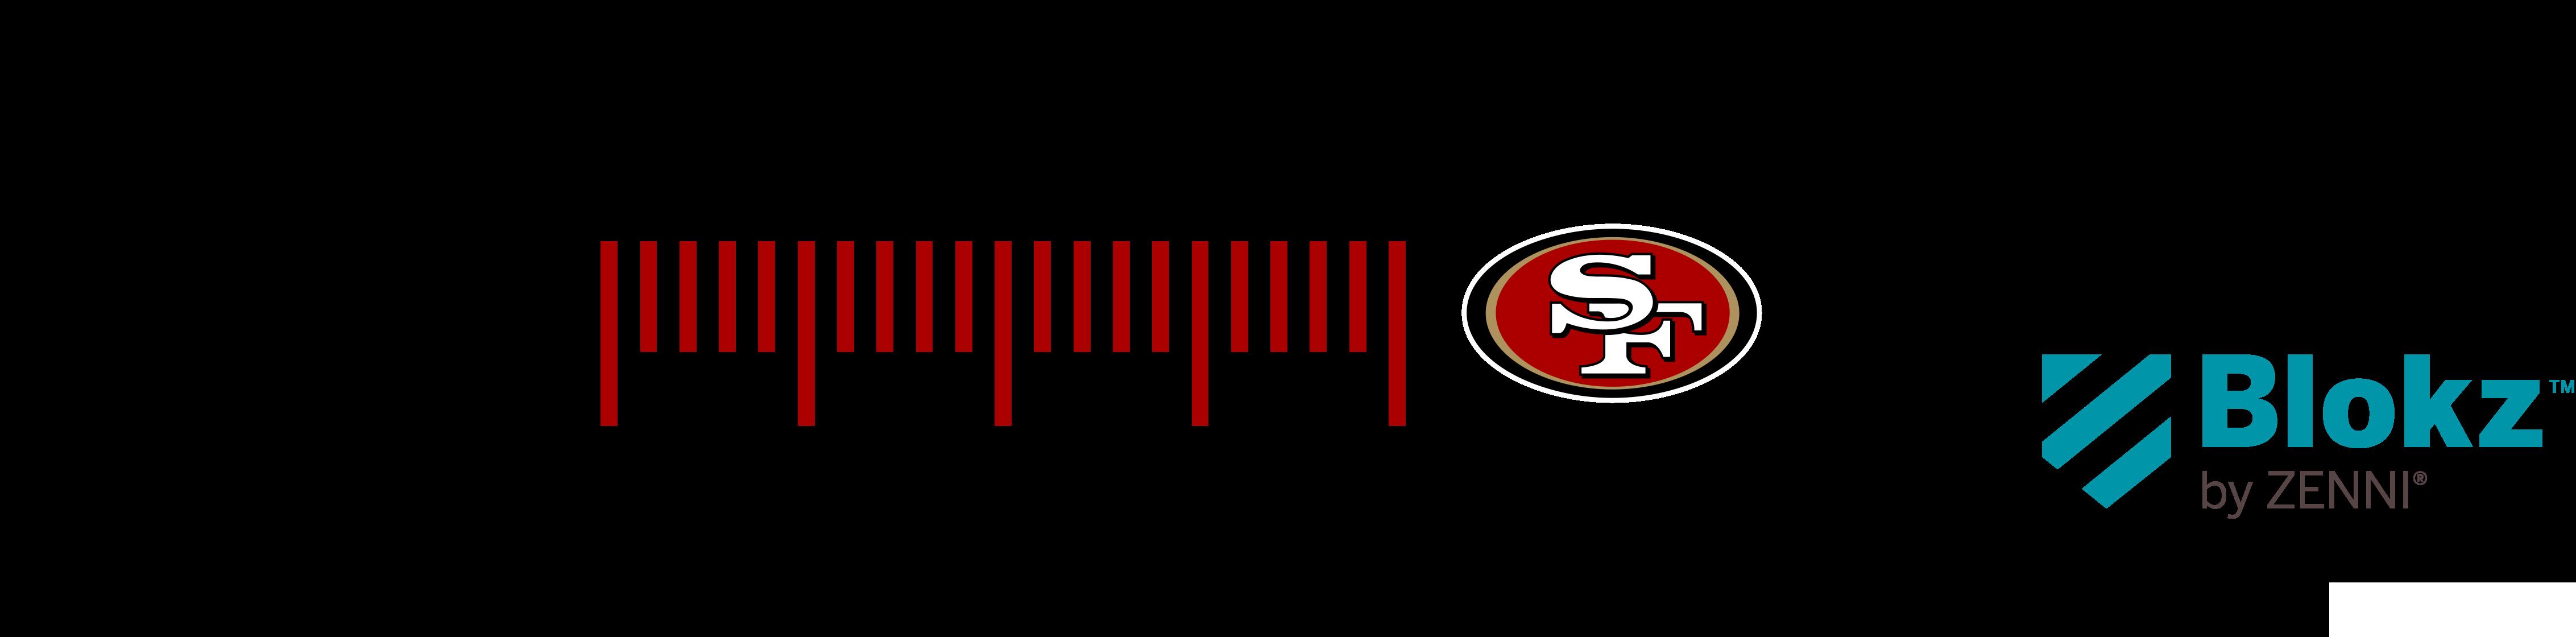 EA_MADDEN_21_CLUB_CHAMPIONSHIP_W_49ers_HORIZ_03_BLACK